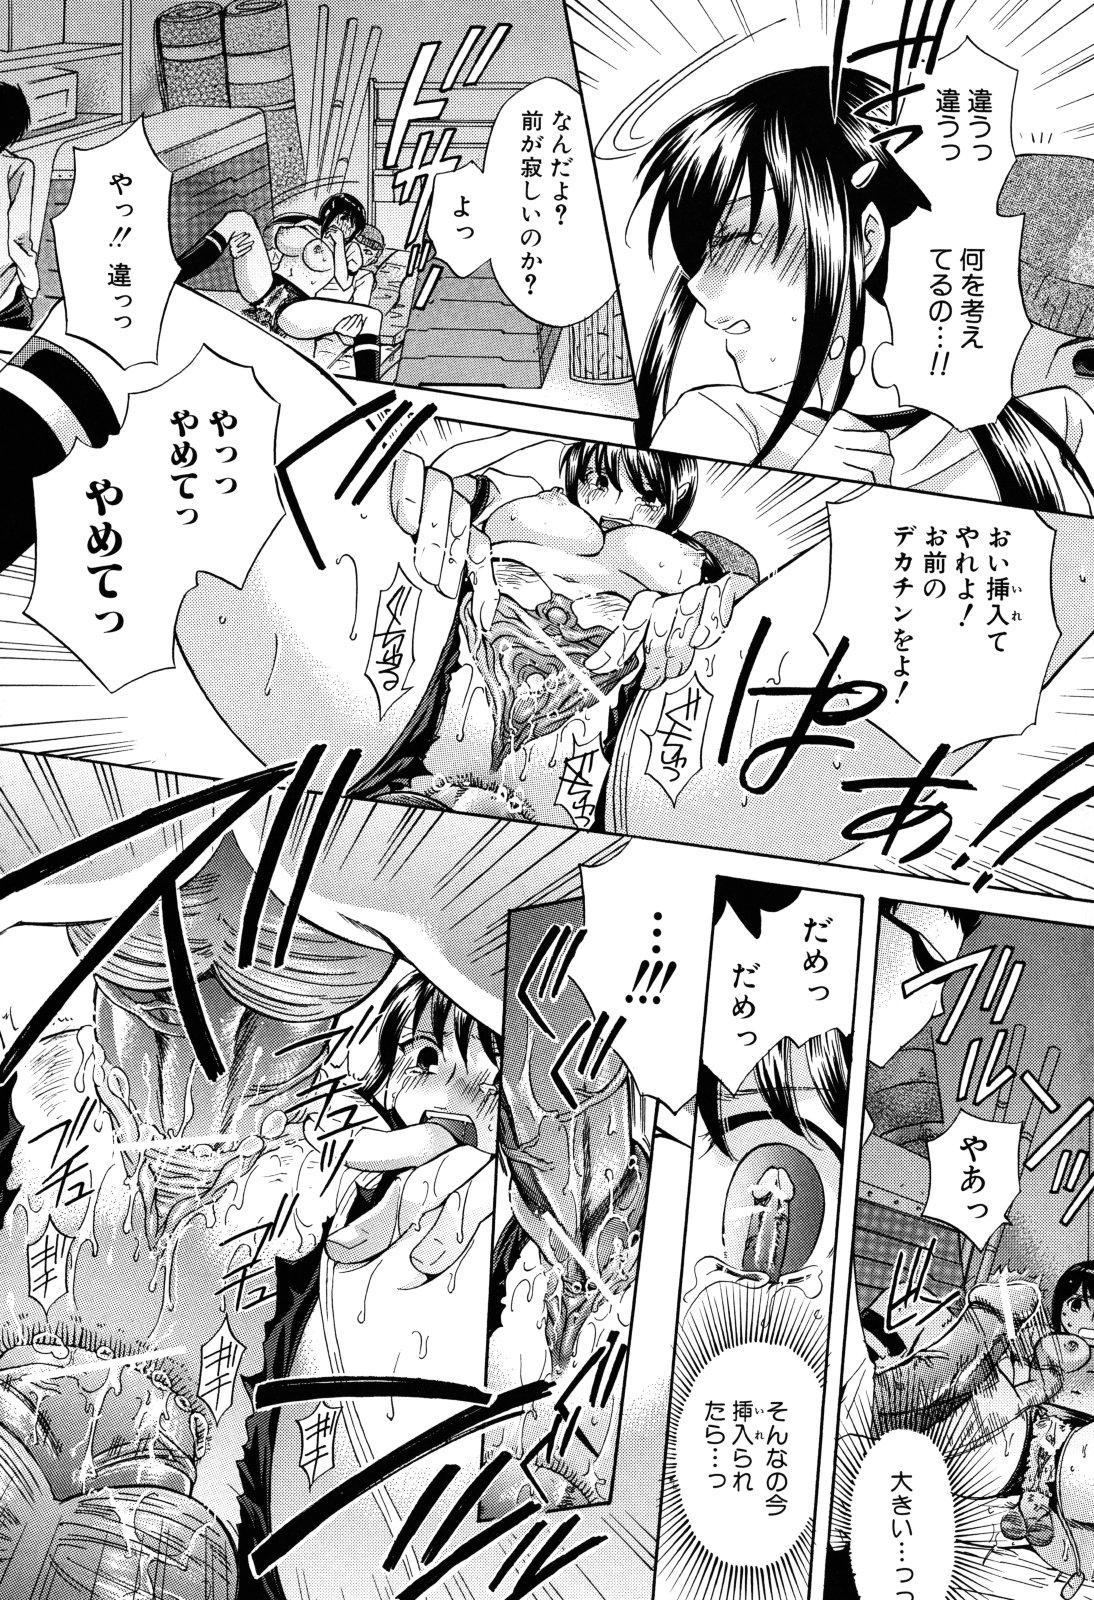 Kanojo ga Ochiru made - She in the depth 178